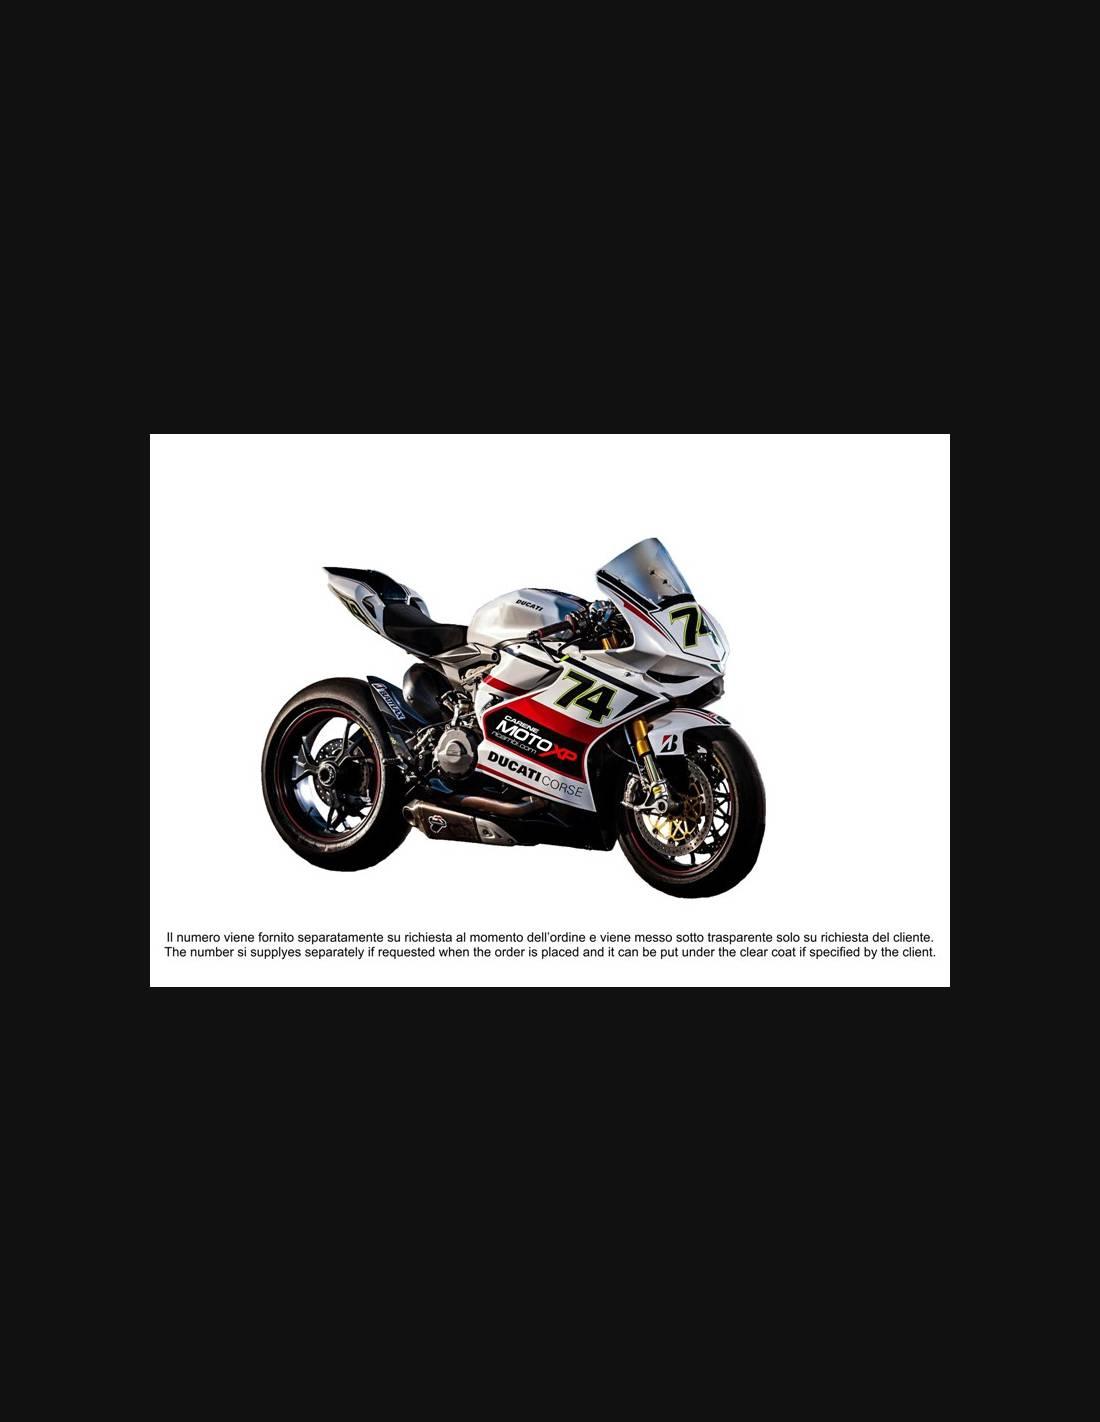 Plexiglas trasparente per cafè racer custom vintage classic motorcycle